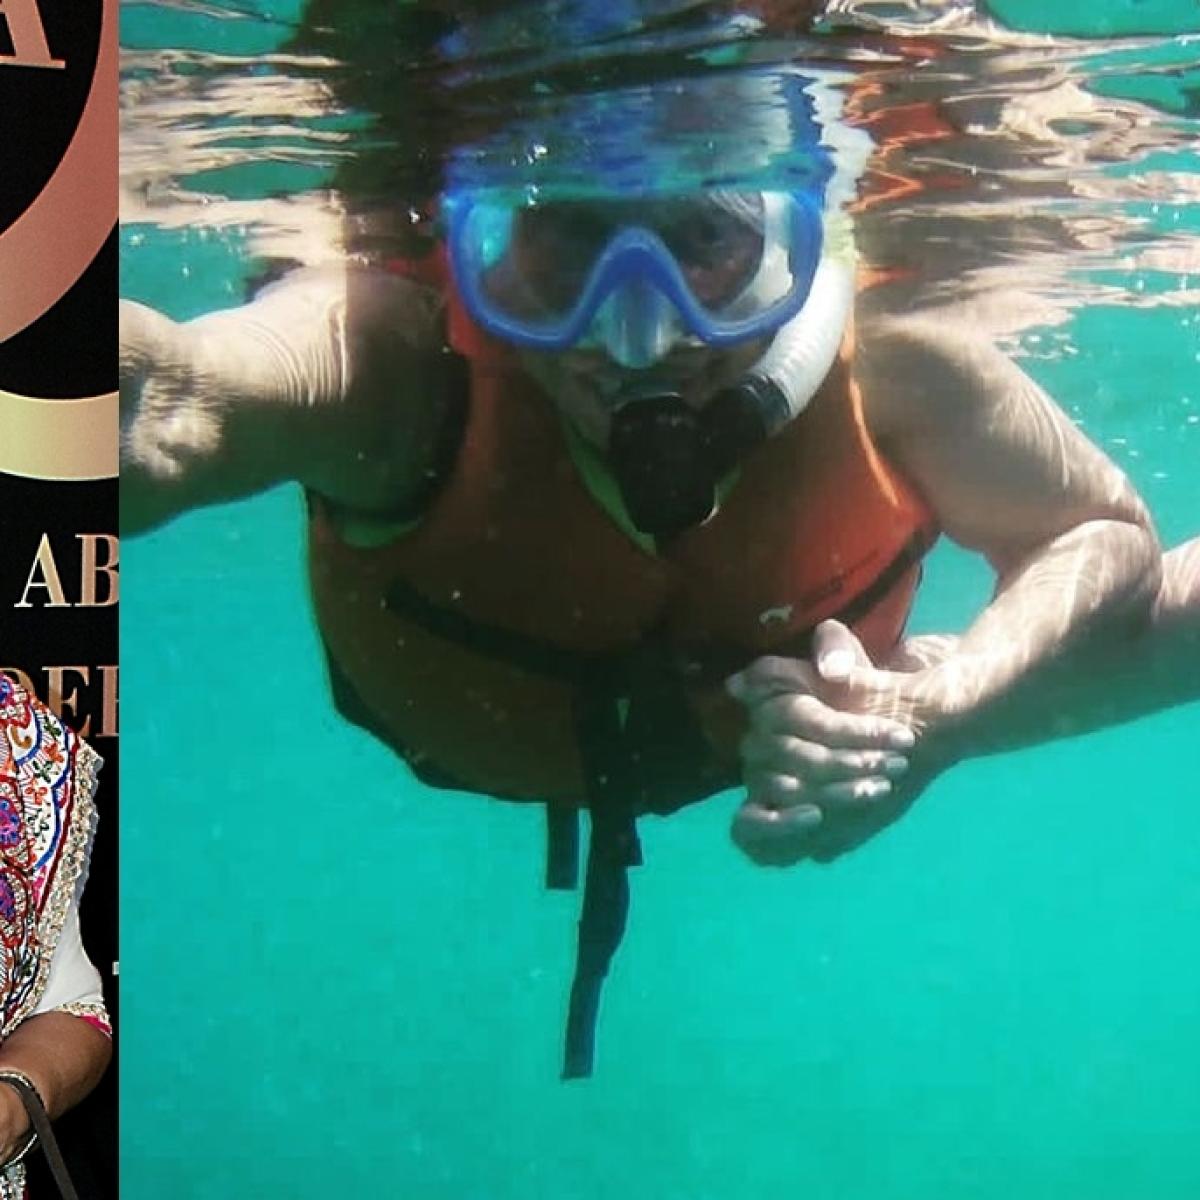 Waheeda Rehman, 83, goes snorkeling with daughter Kashvi at Andaman Islands